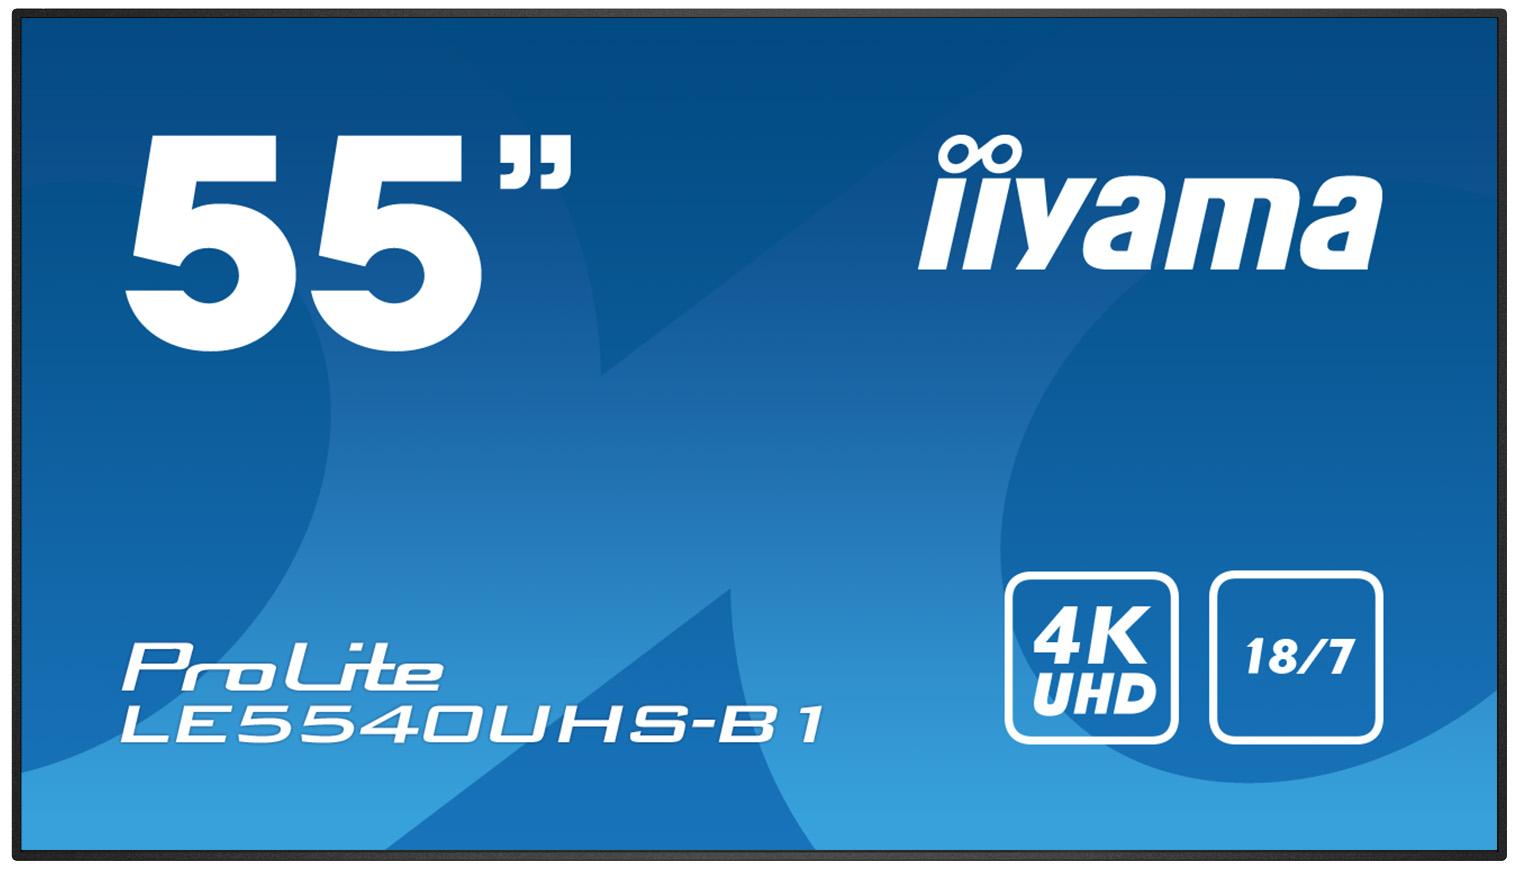 55'' iiyama LE5540UHS-B1 - AMVA3,4K UHD,8ms,350cd/m2, 4000:1,16:9,VGA,HDMI,DVI,USB,RS232,RJ45,repro - LE5540UHS-B1